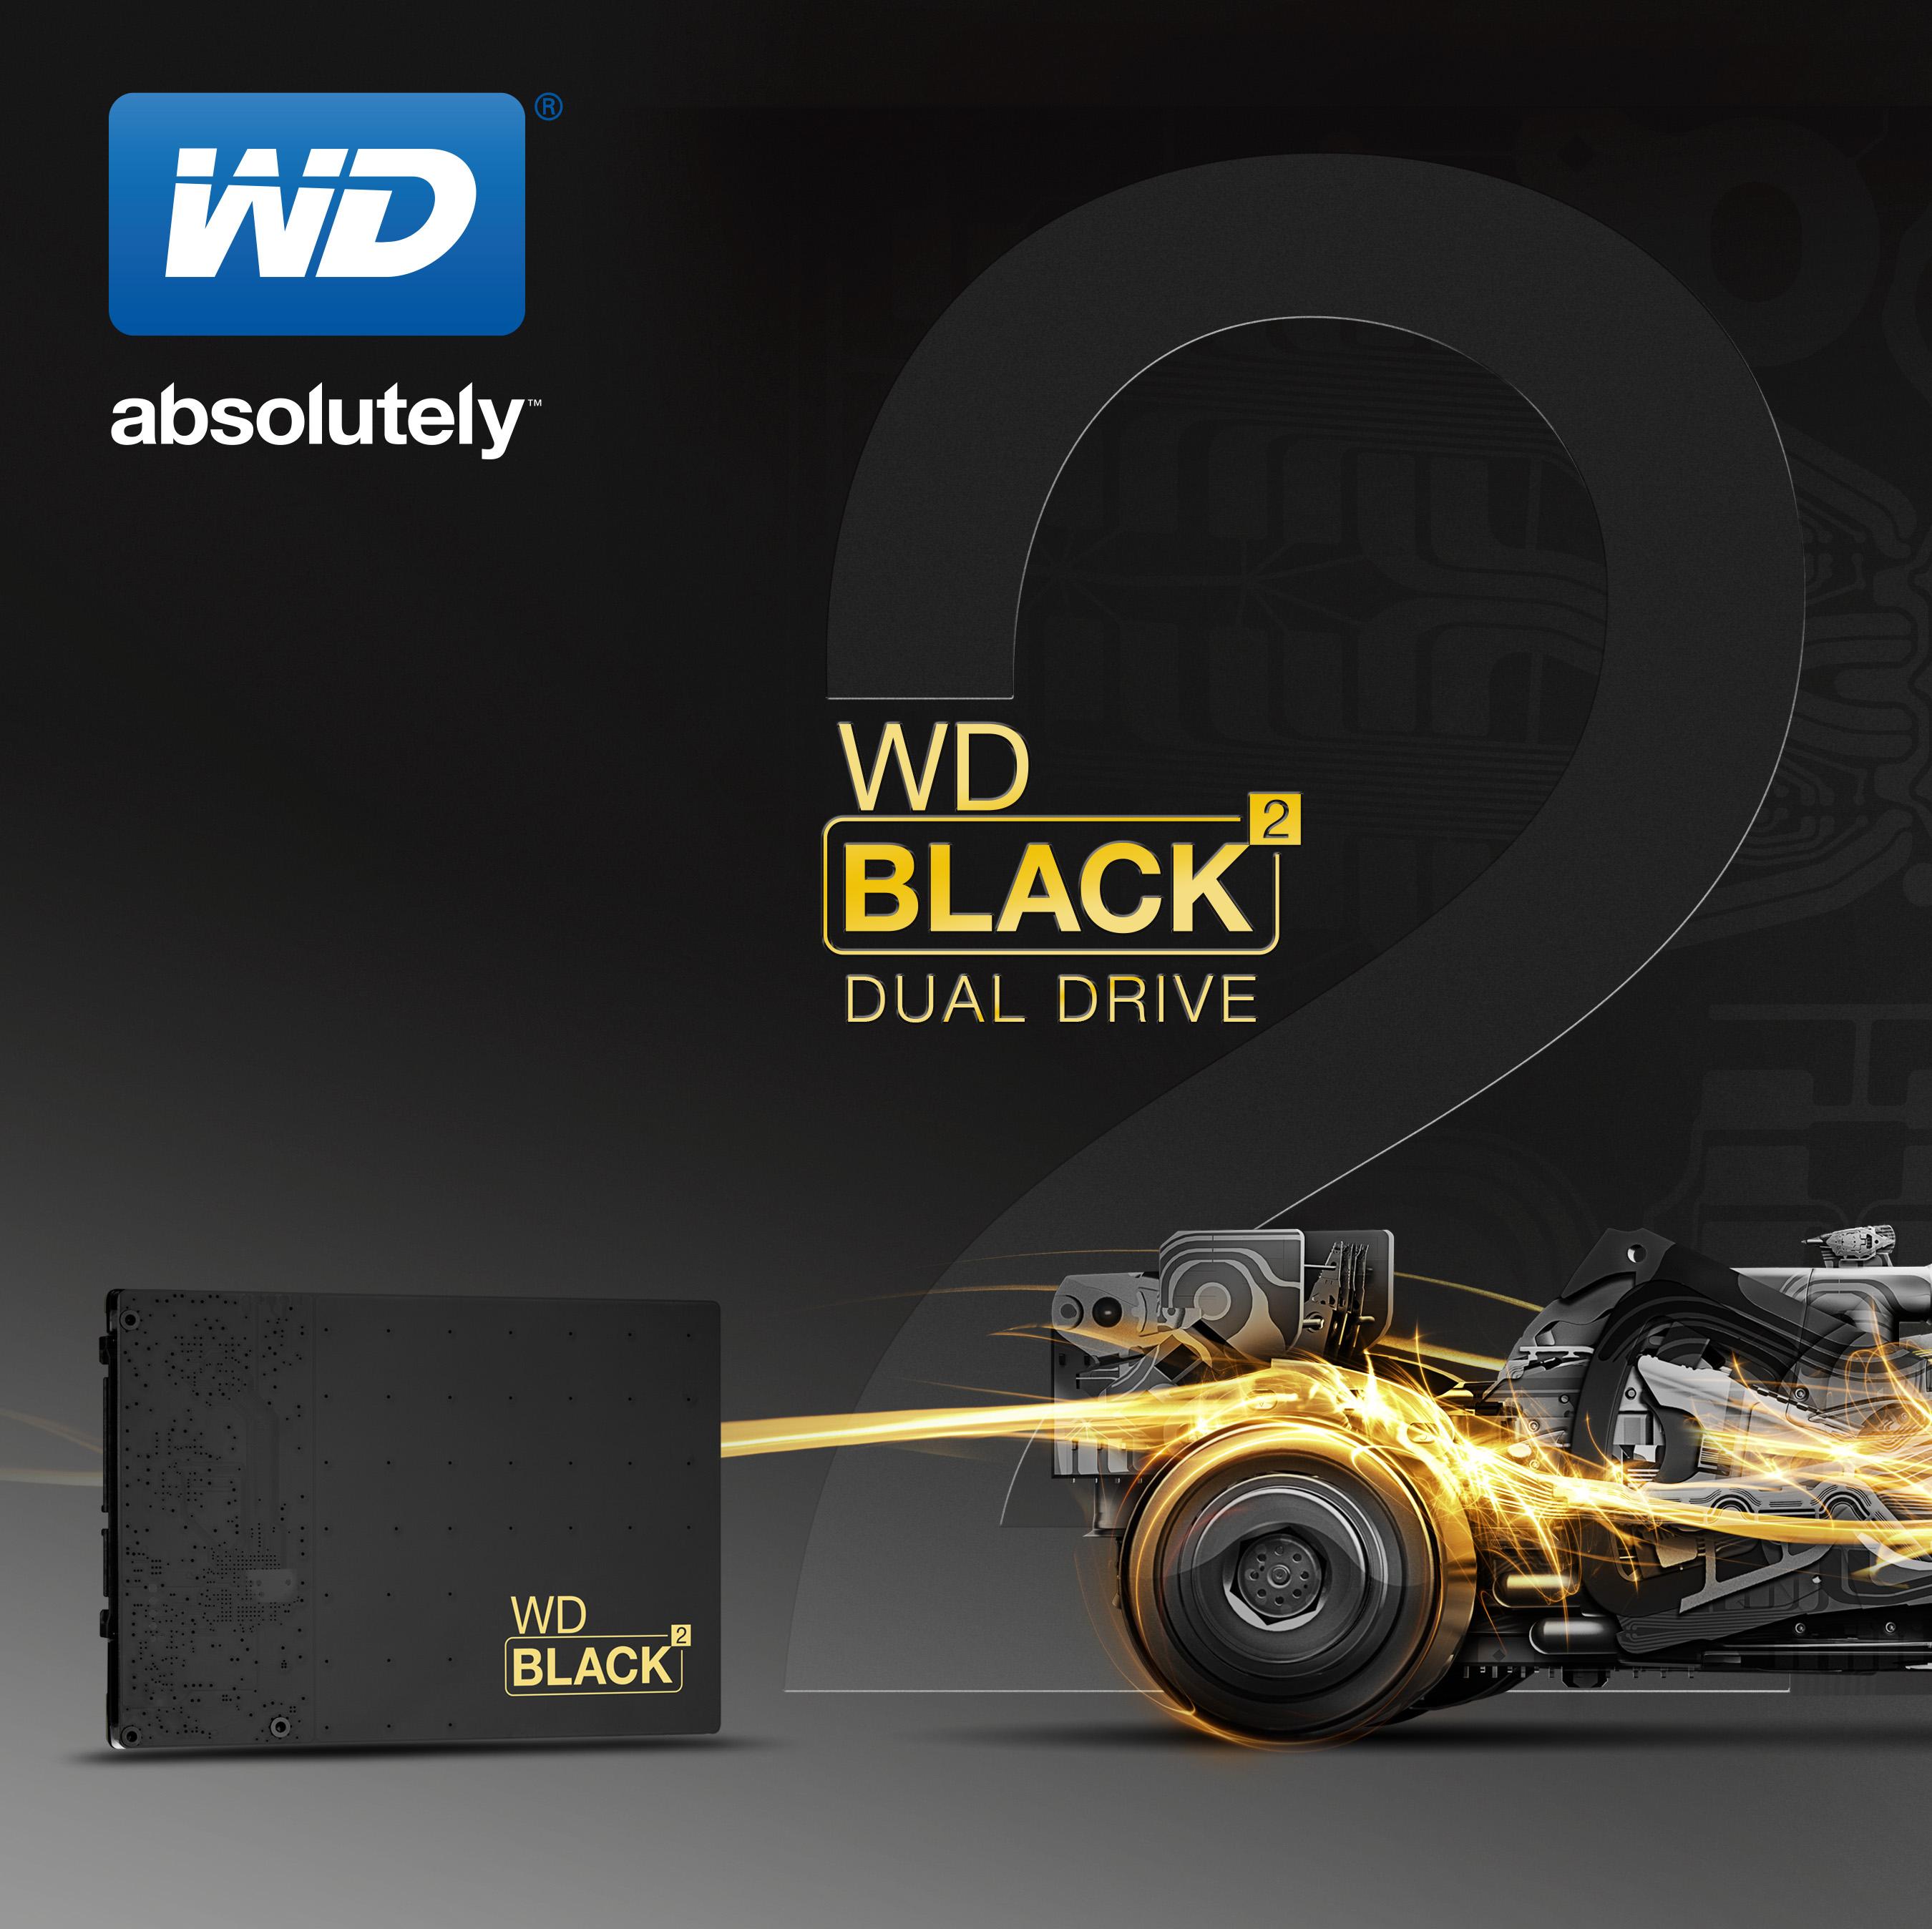 Disco ibrido WD